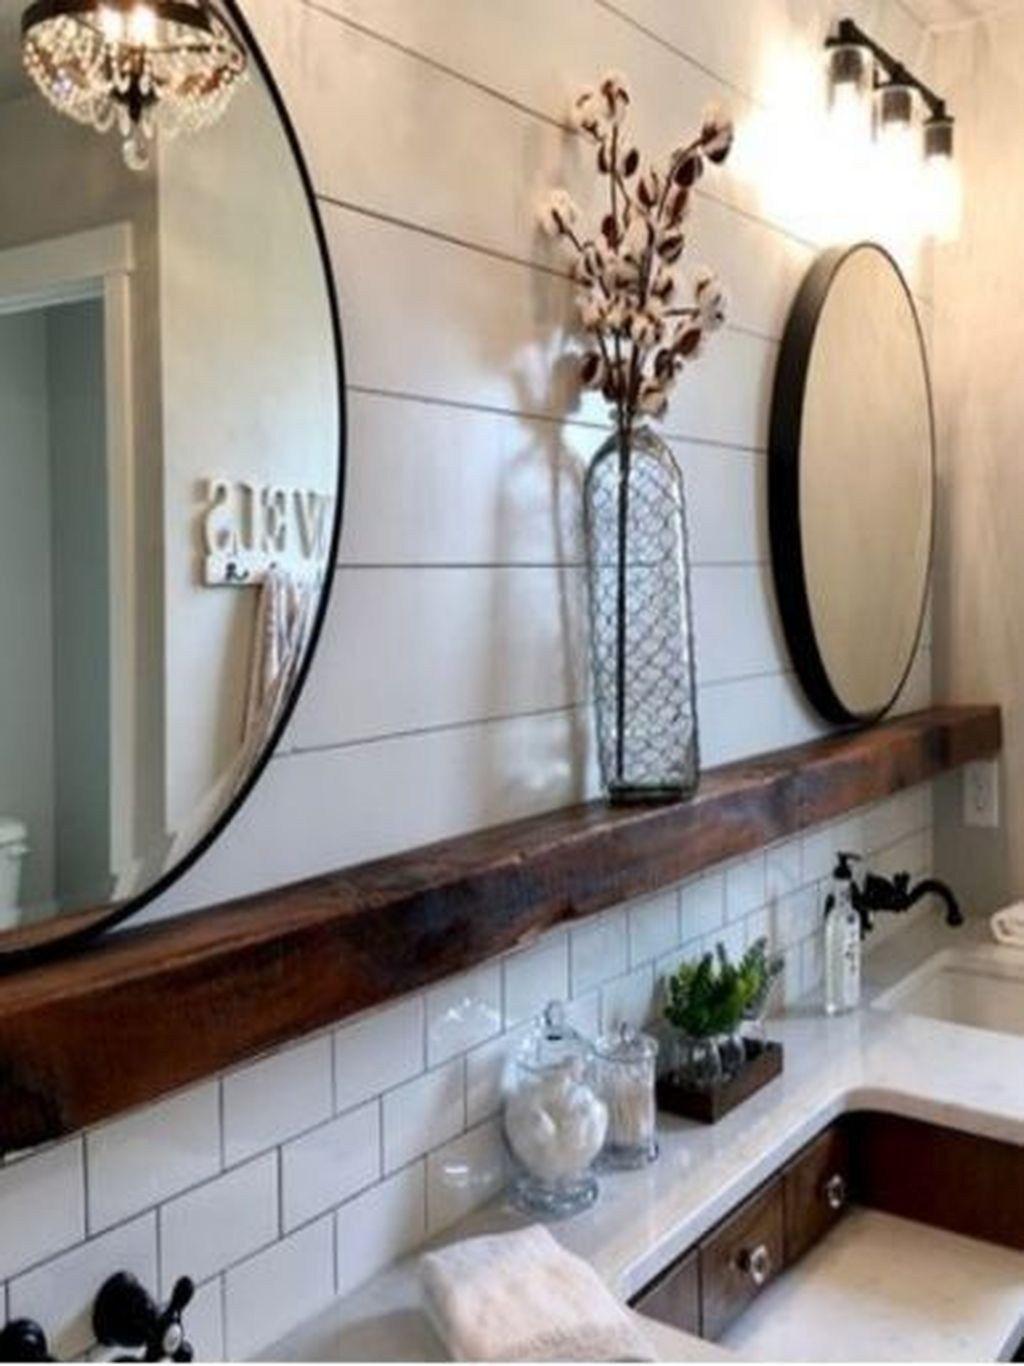 Inspiring Backsplash Bathroom Ideas For Inspiration 08 Small Farmhouse Bathroom Rustic Bathrooms Bathroom Decor